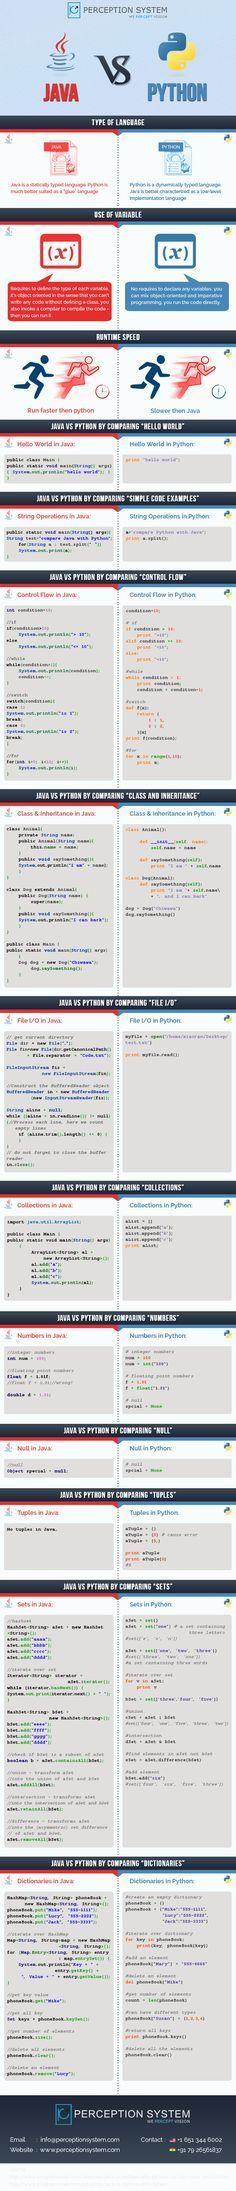 Java Vs. Python- Which Programming Language is More Productive?... #java #python #infographic